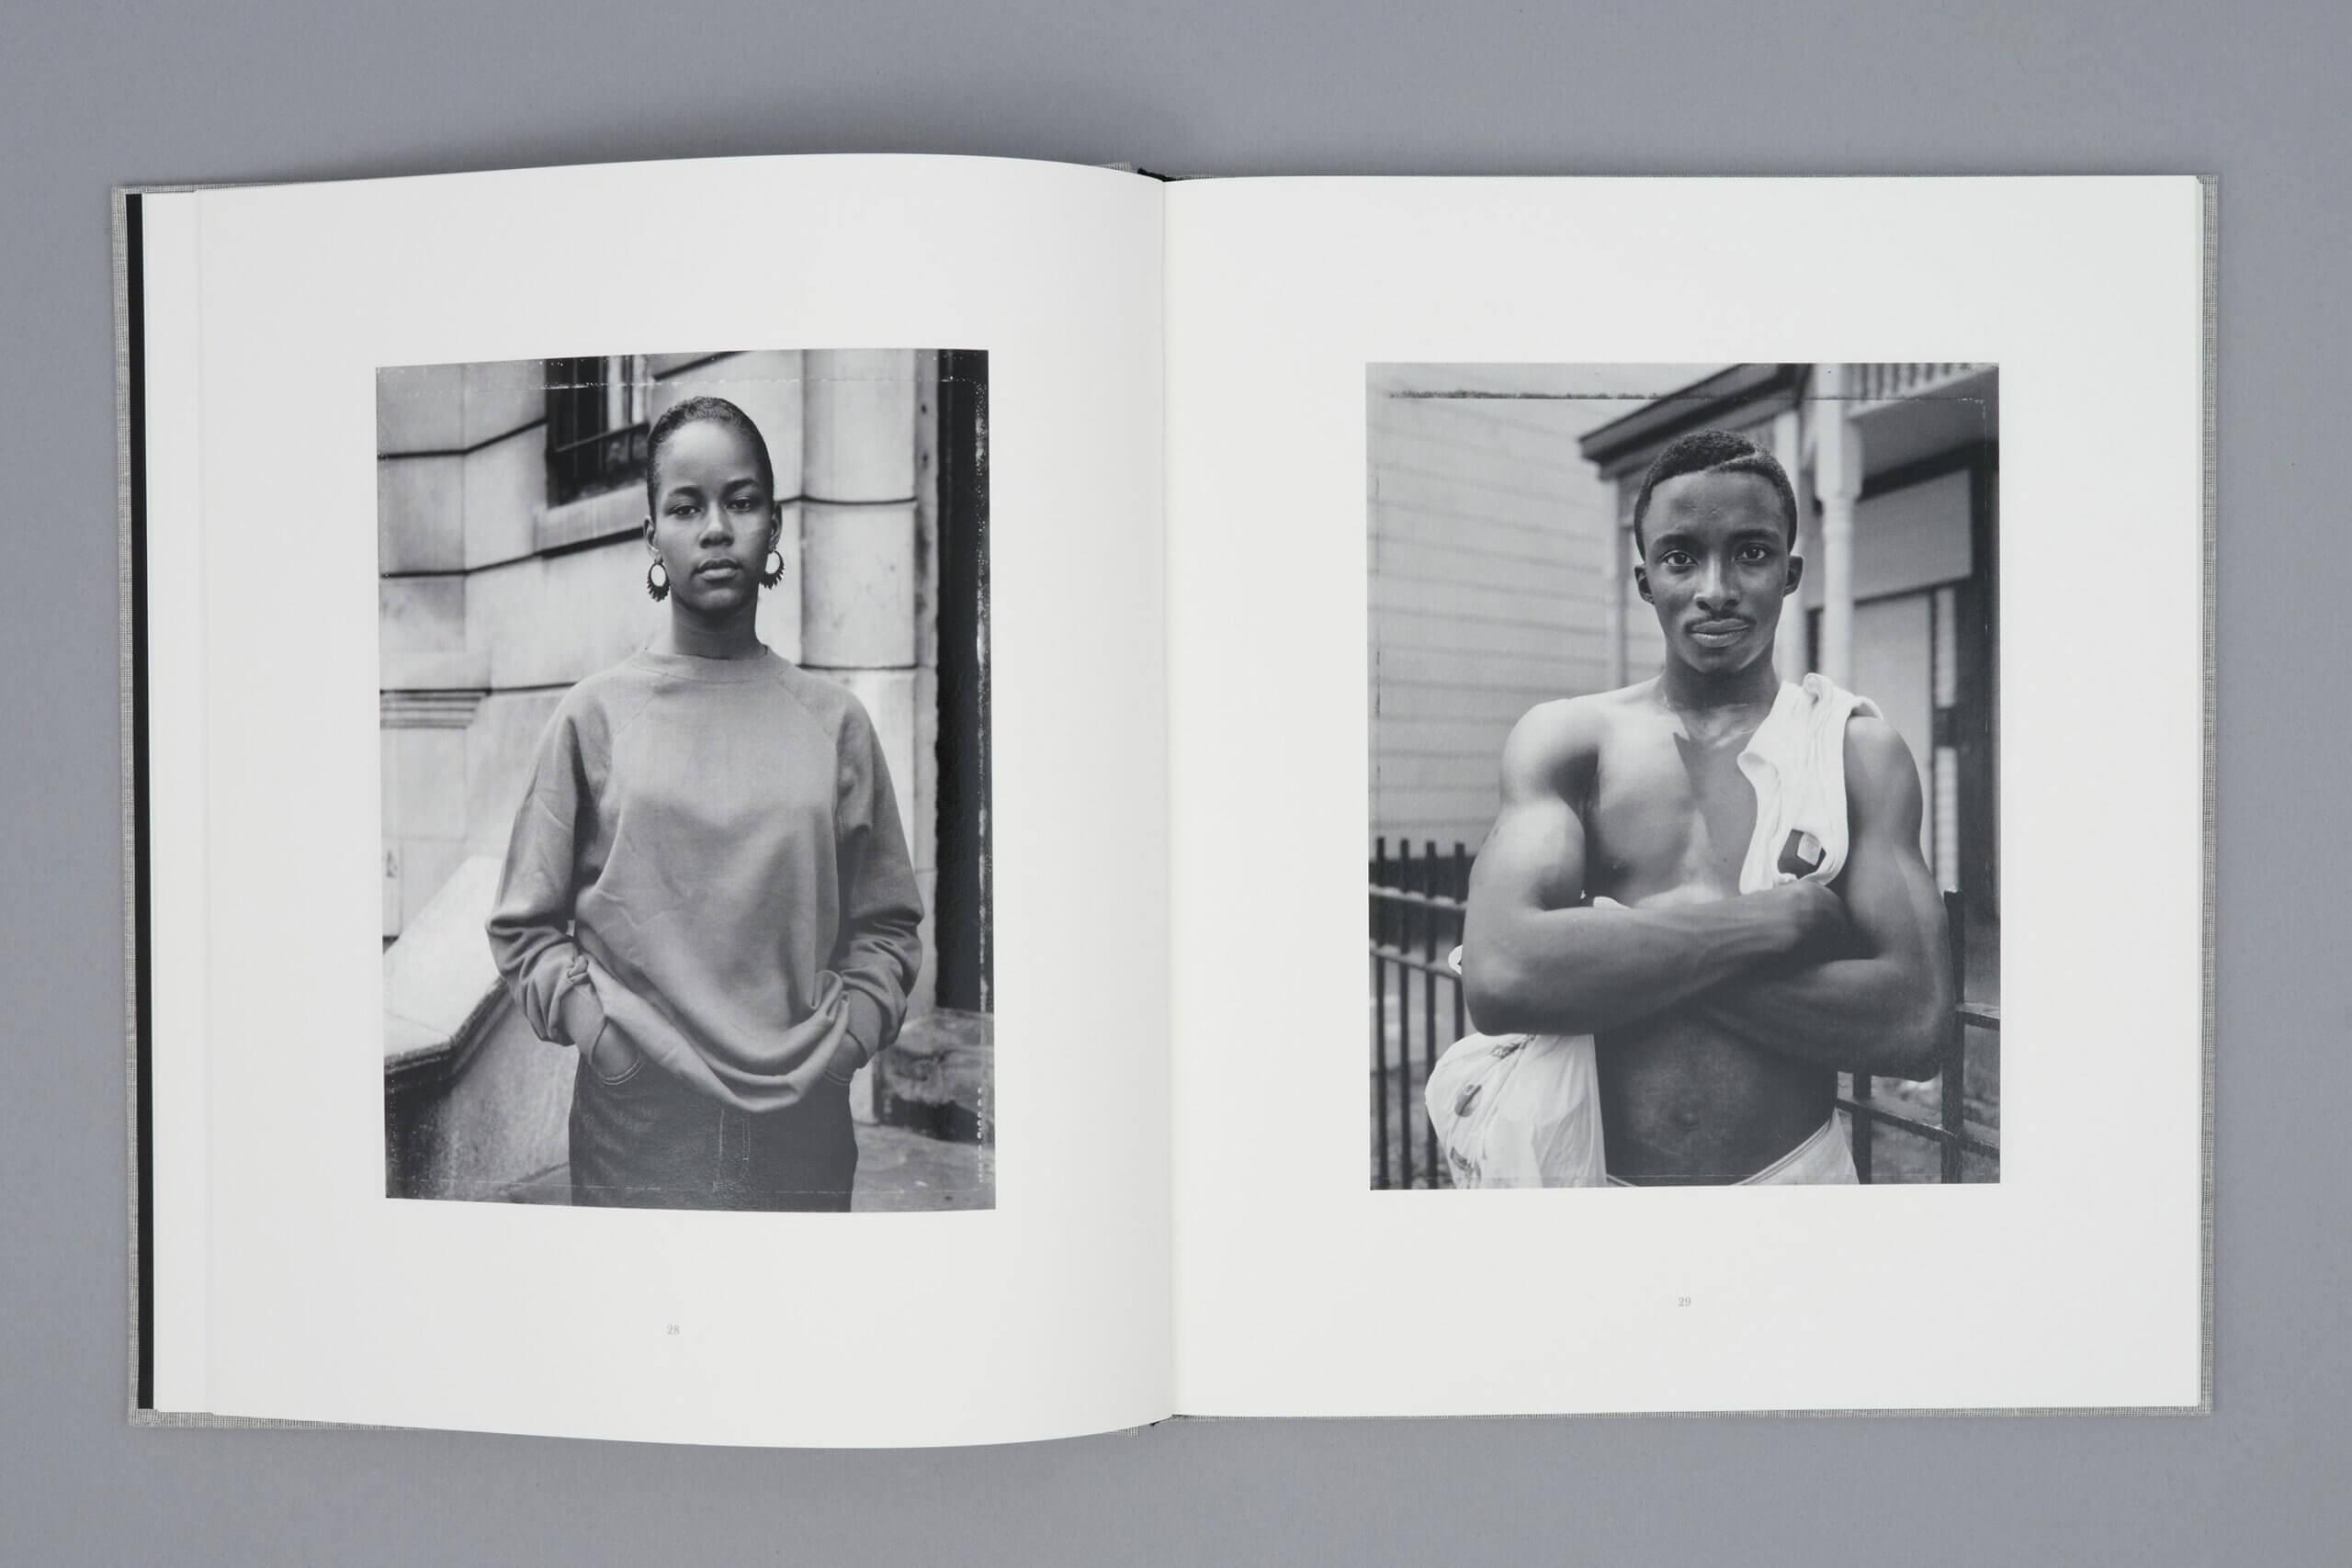 daoud-bey-street-portraits-4